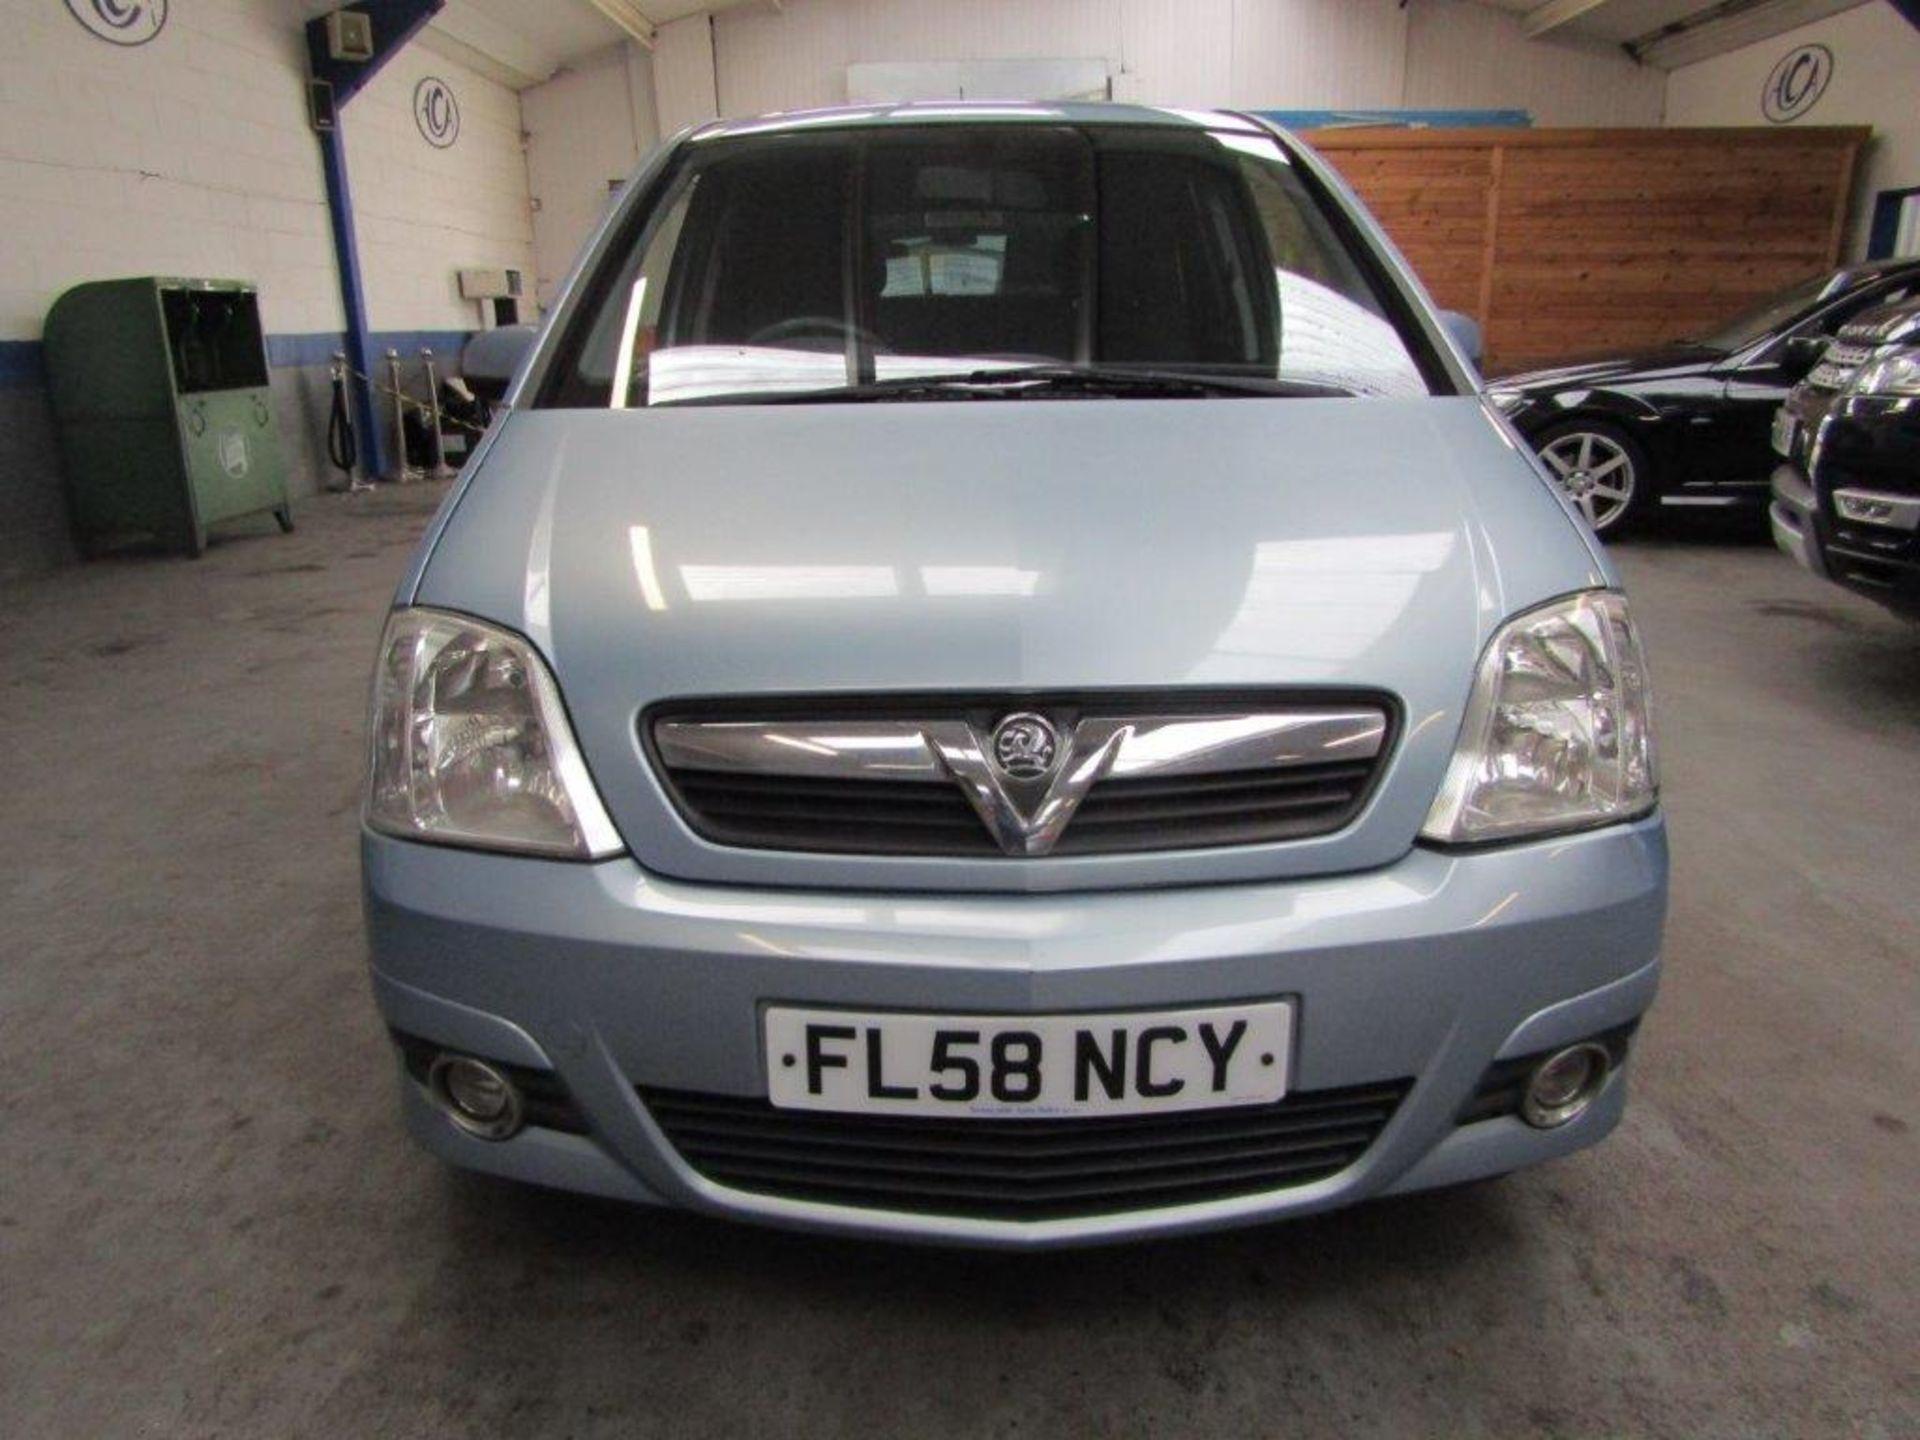 58 08 Vauxhall Meriva Design - Image 11 of 25